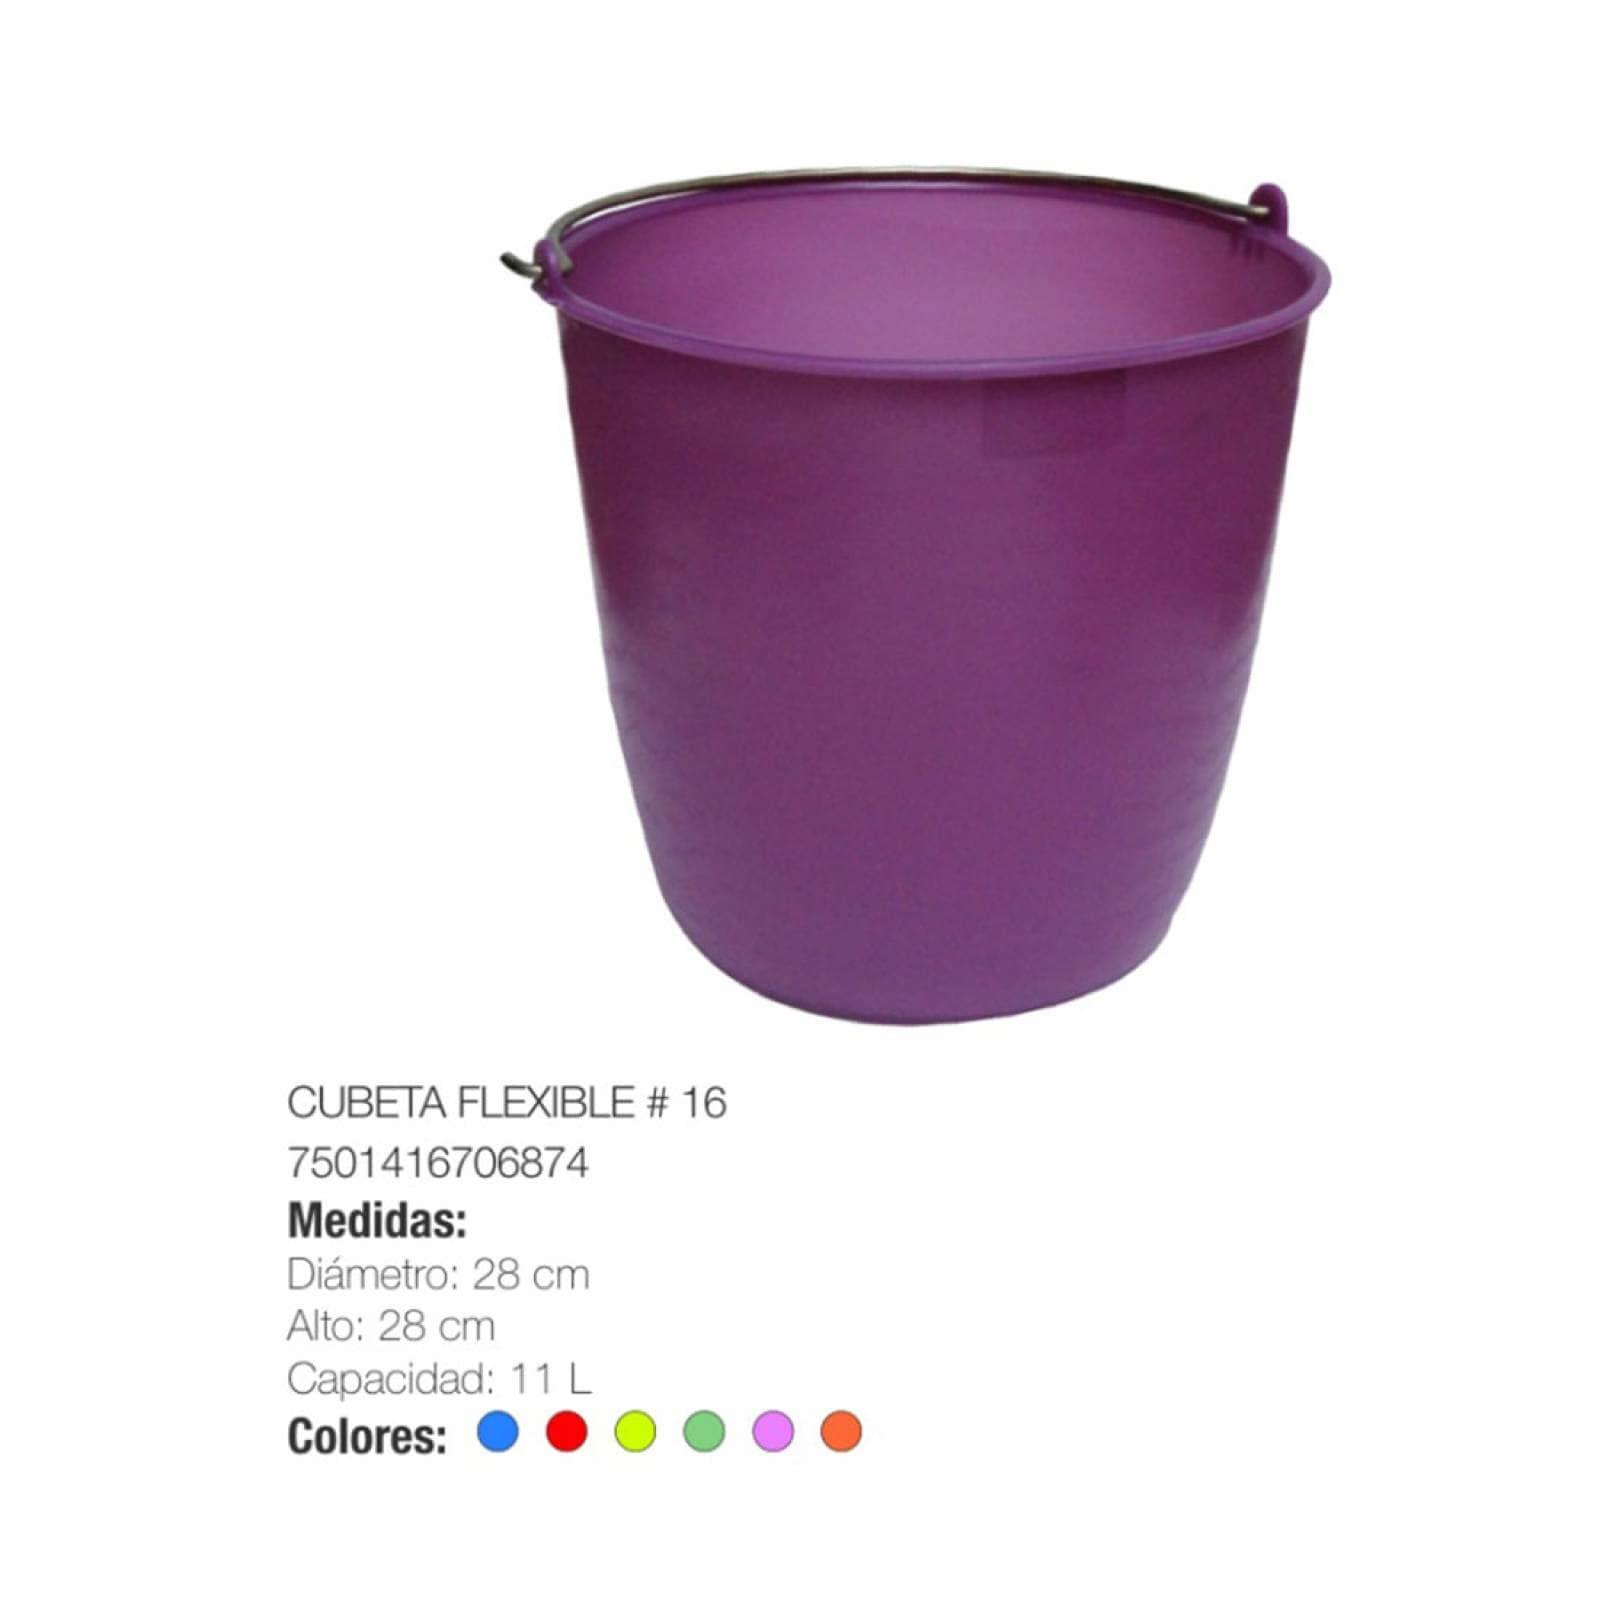 Cubeta Flexible N° 16 Plástico Limpieza Torosqui Assorted